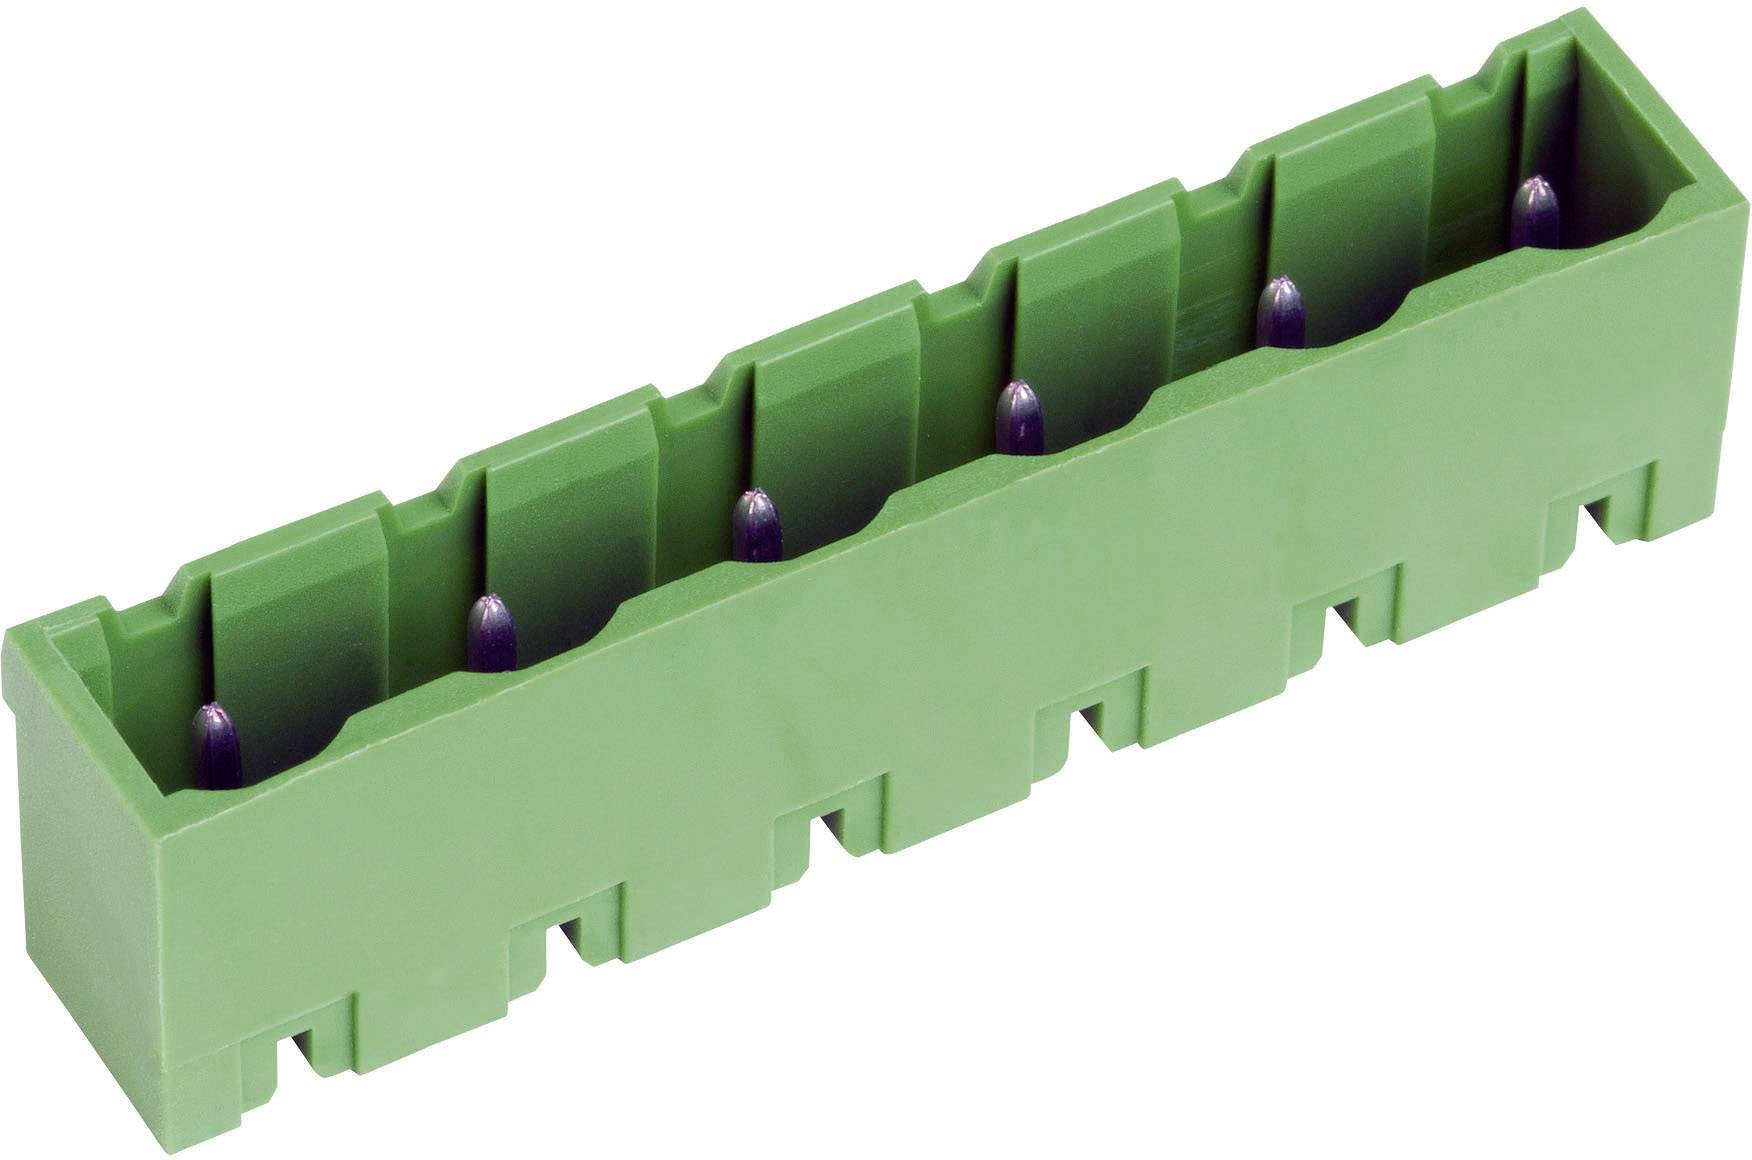 Konektor do DPS PTR STLZ960/8G-7.62-V 50960085121D, 60.96 mm, pólů 8, rozteč 7.62 mm, 1 ks